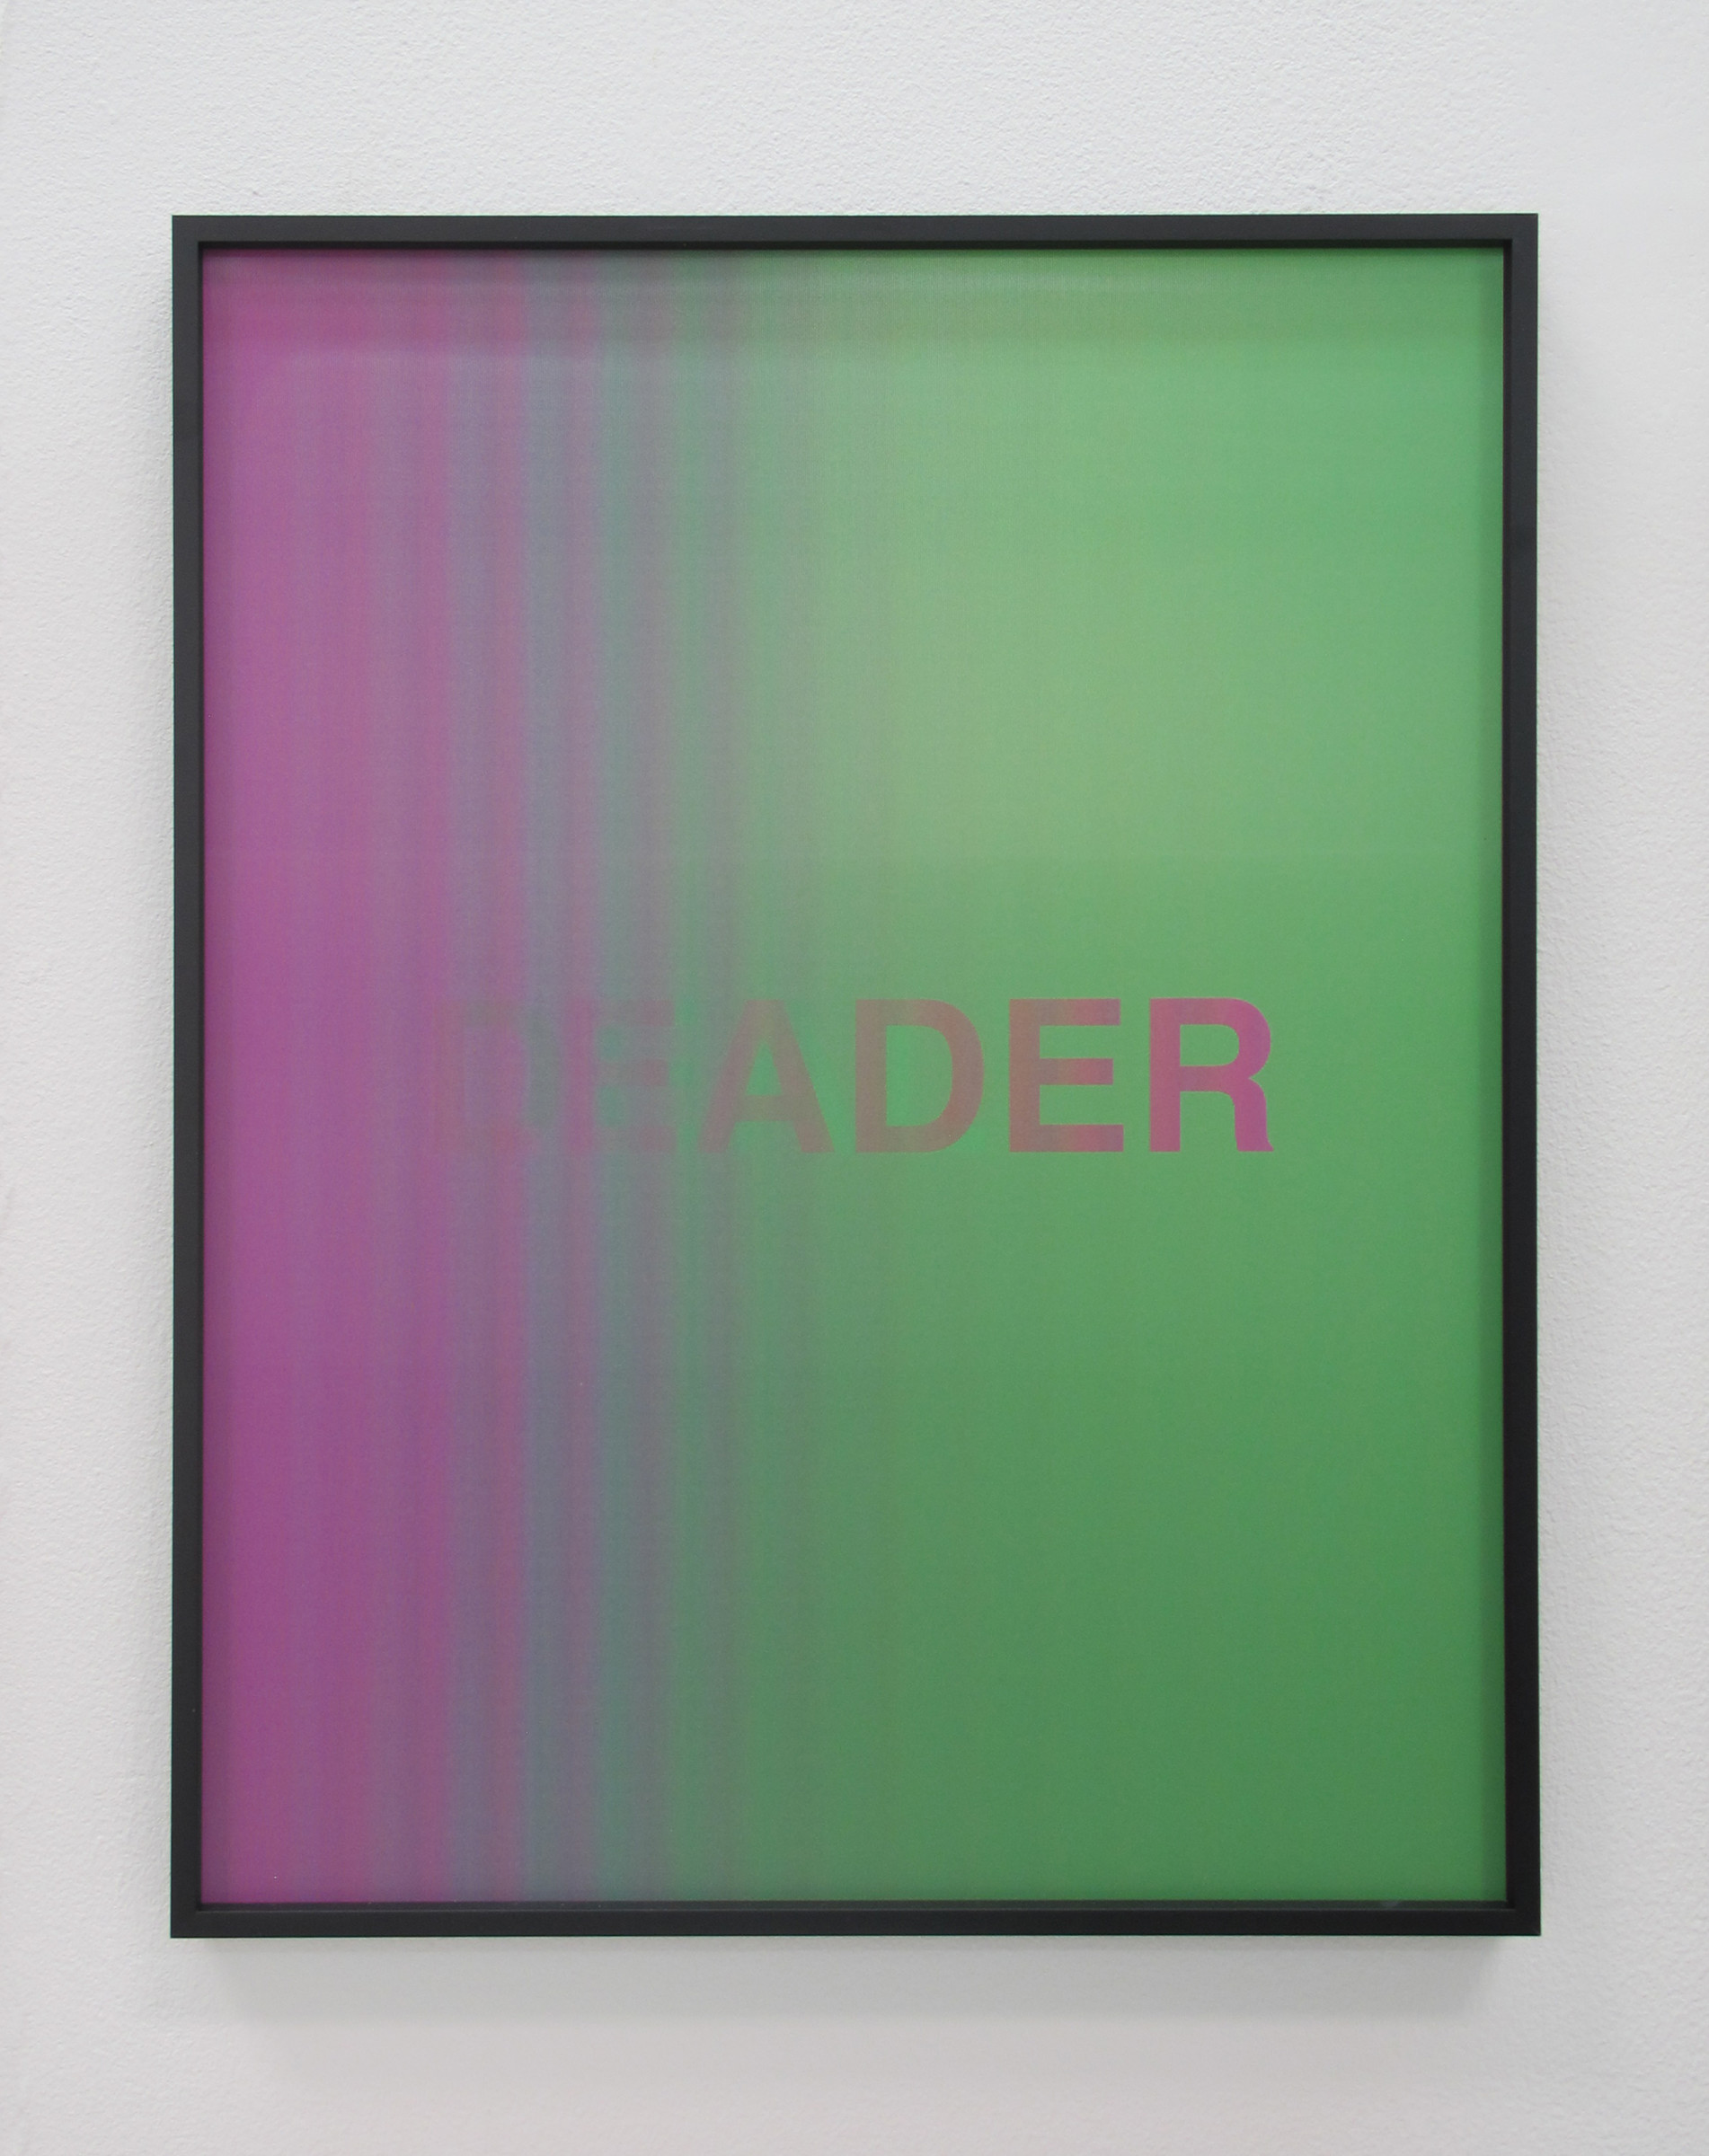 <span class=&#34;link fancybox-details-link&#34;><a href=&#34;/exhibitions/41/works/artworks1582/&#34;>View Detail Page</a></span><div class=&#34;medium&#34;> HD lenticular print</div> <div class=&#34;dimensions&#34;>50 x 40 cm<br /> 19 3/4 x 15 3/4 in</div> <div class=&#34;edition_details&#34;>Edition of 3 + 1 AP</div>